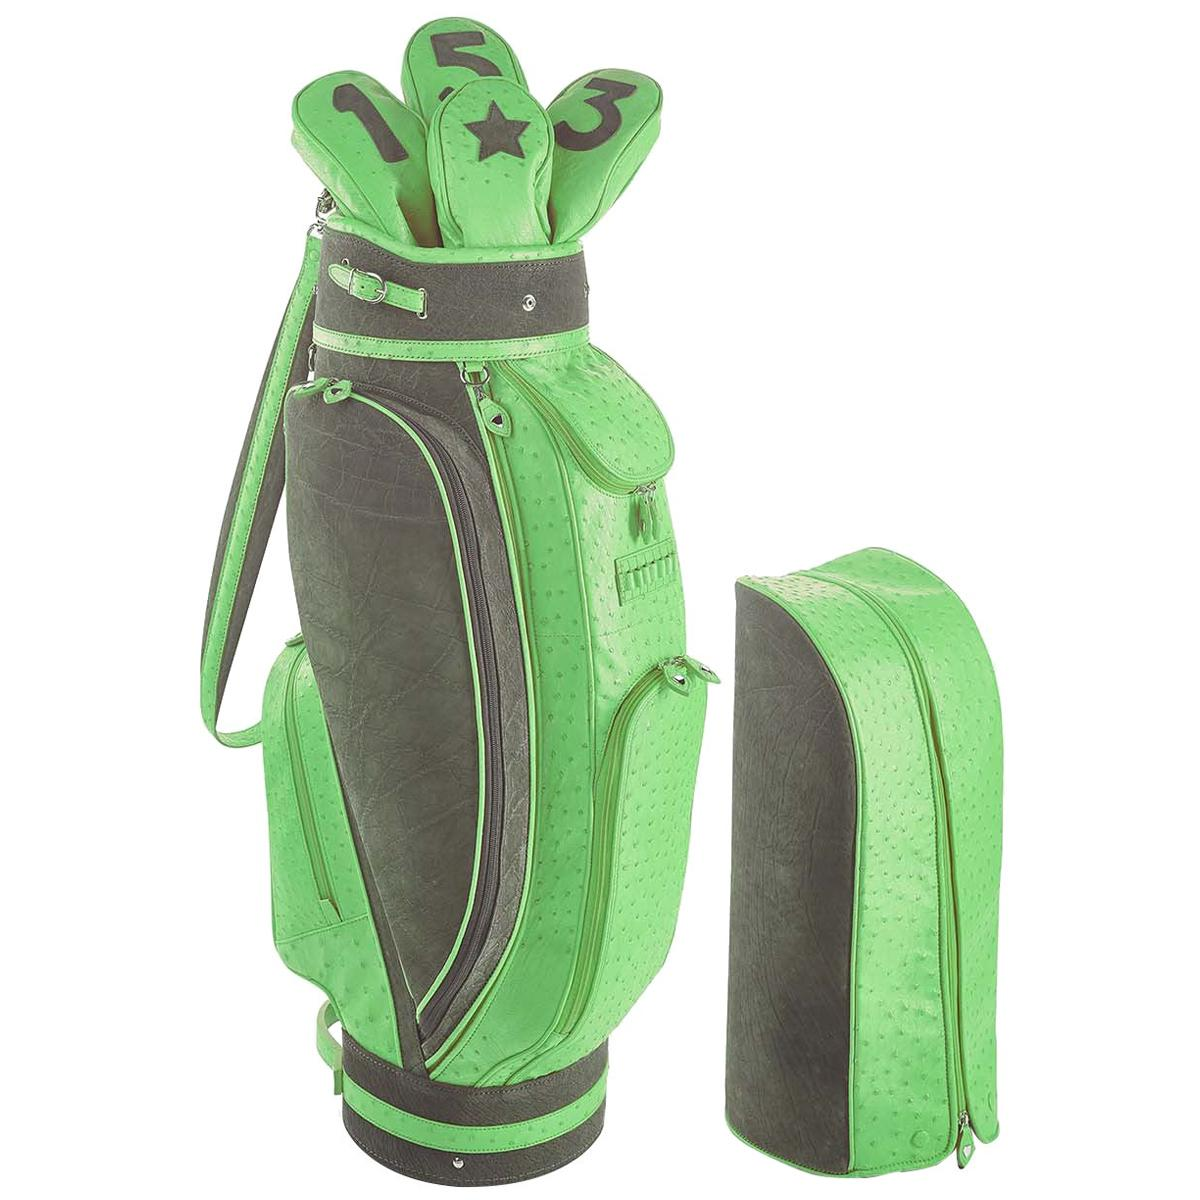 Royal Green Golf Bag by Barchi